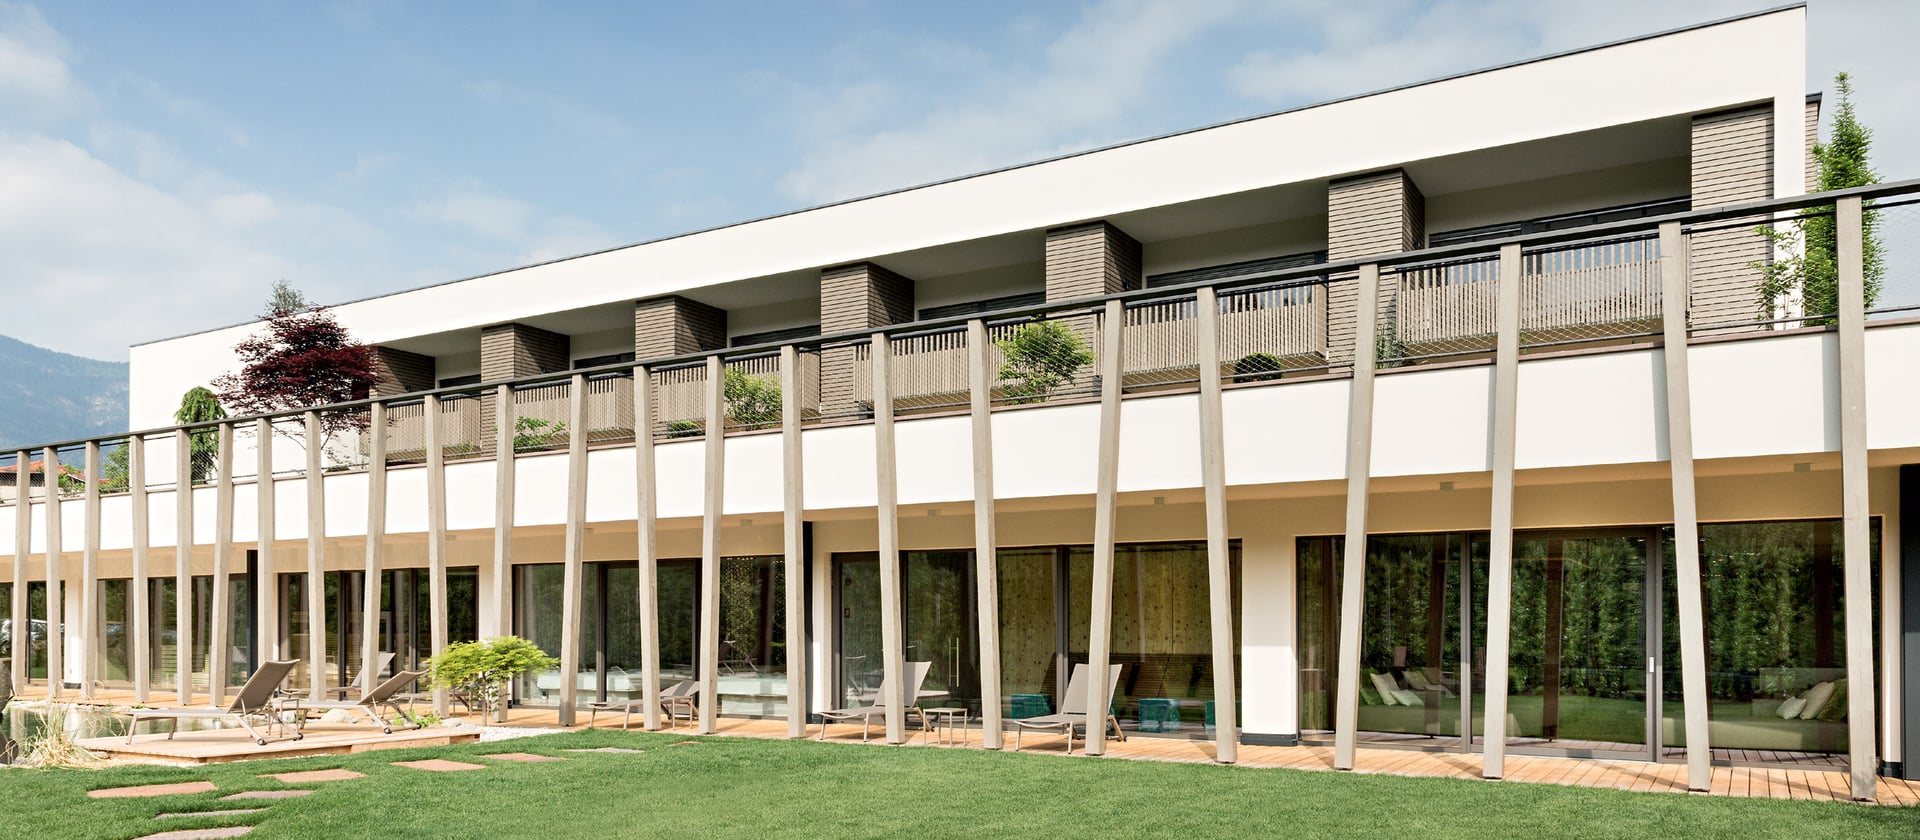 Gartenhotel Moser - ampliamento Ramus